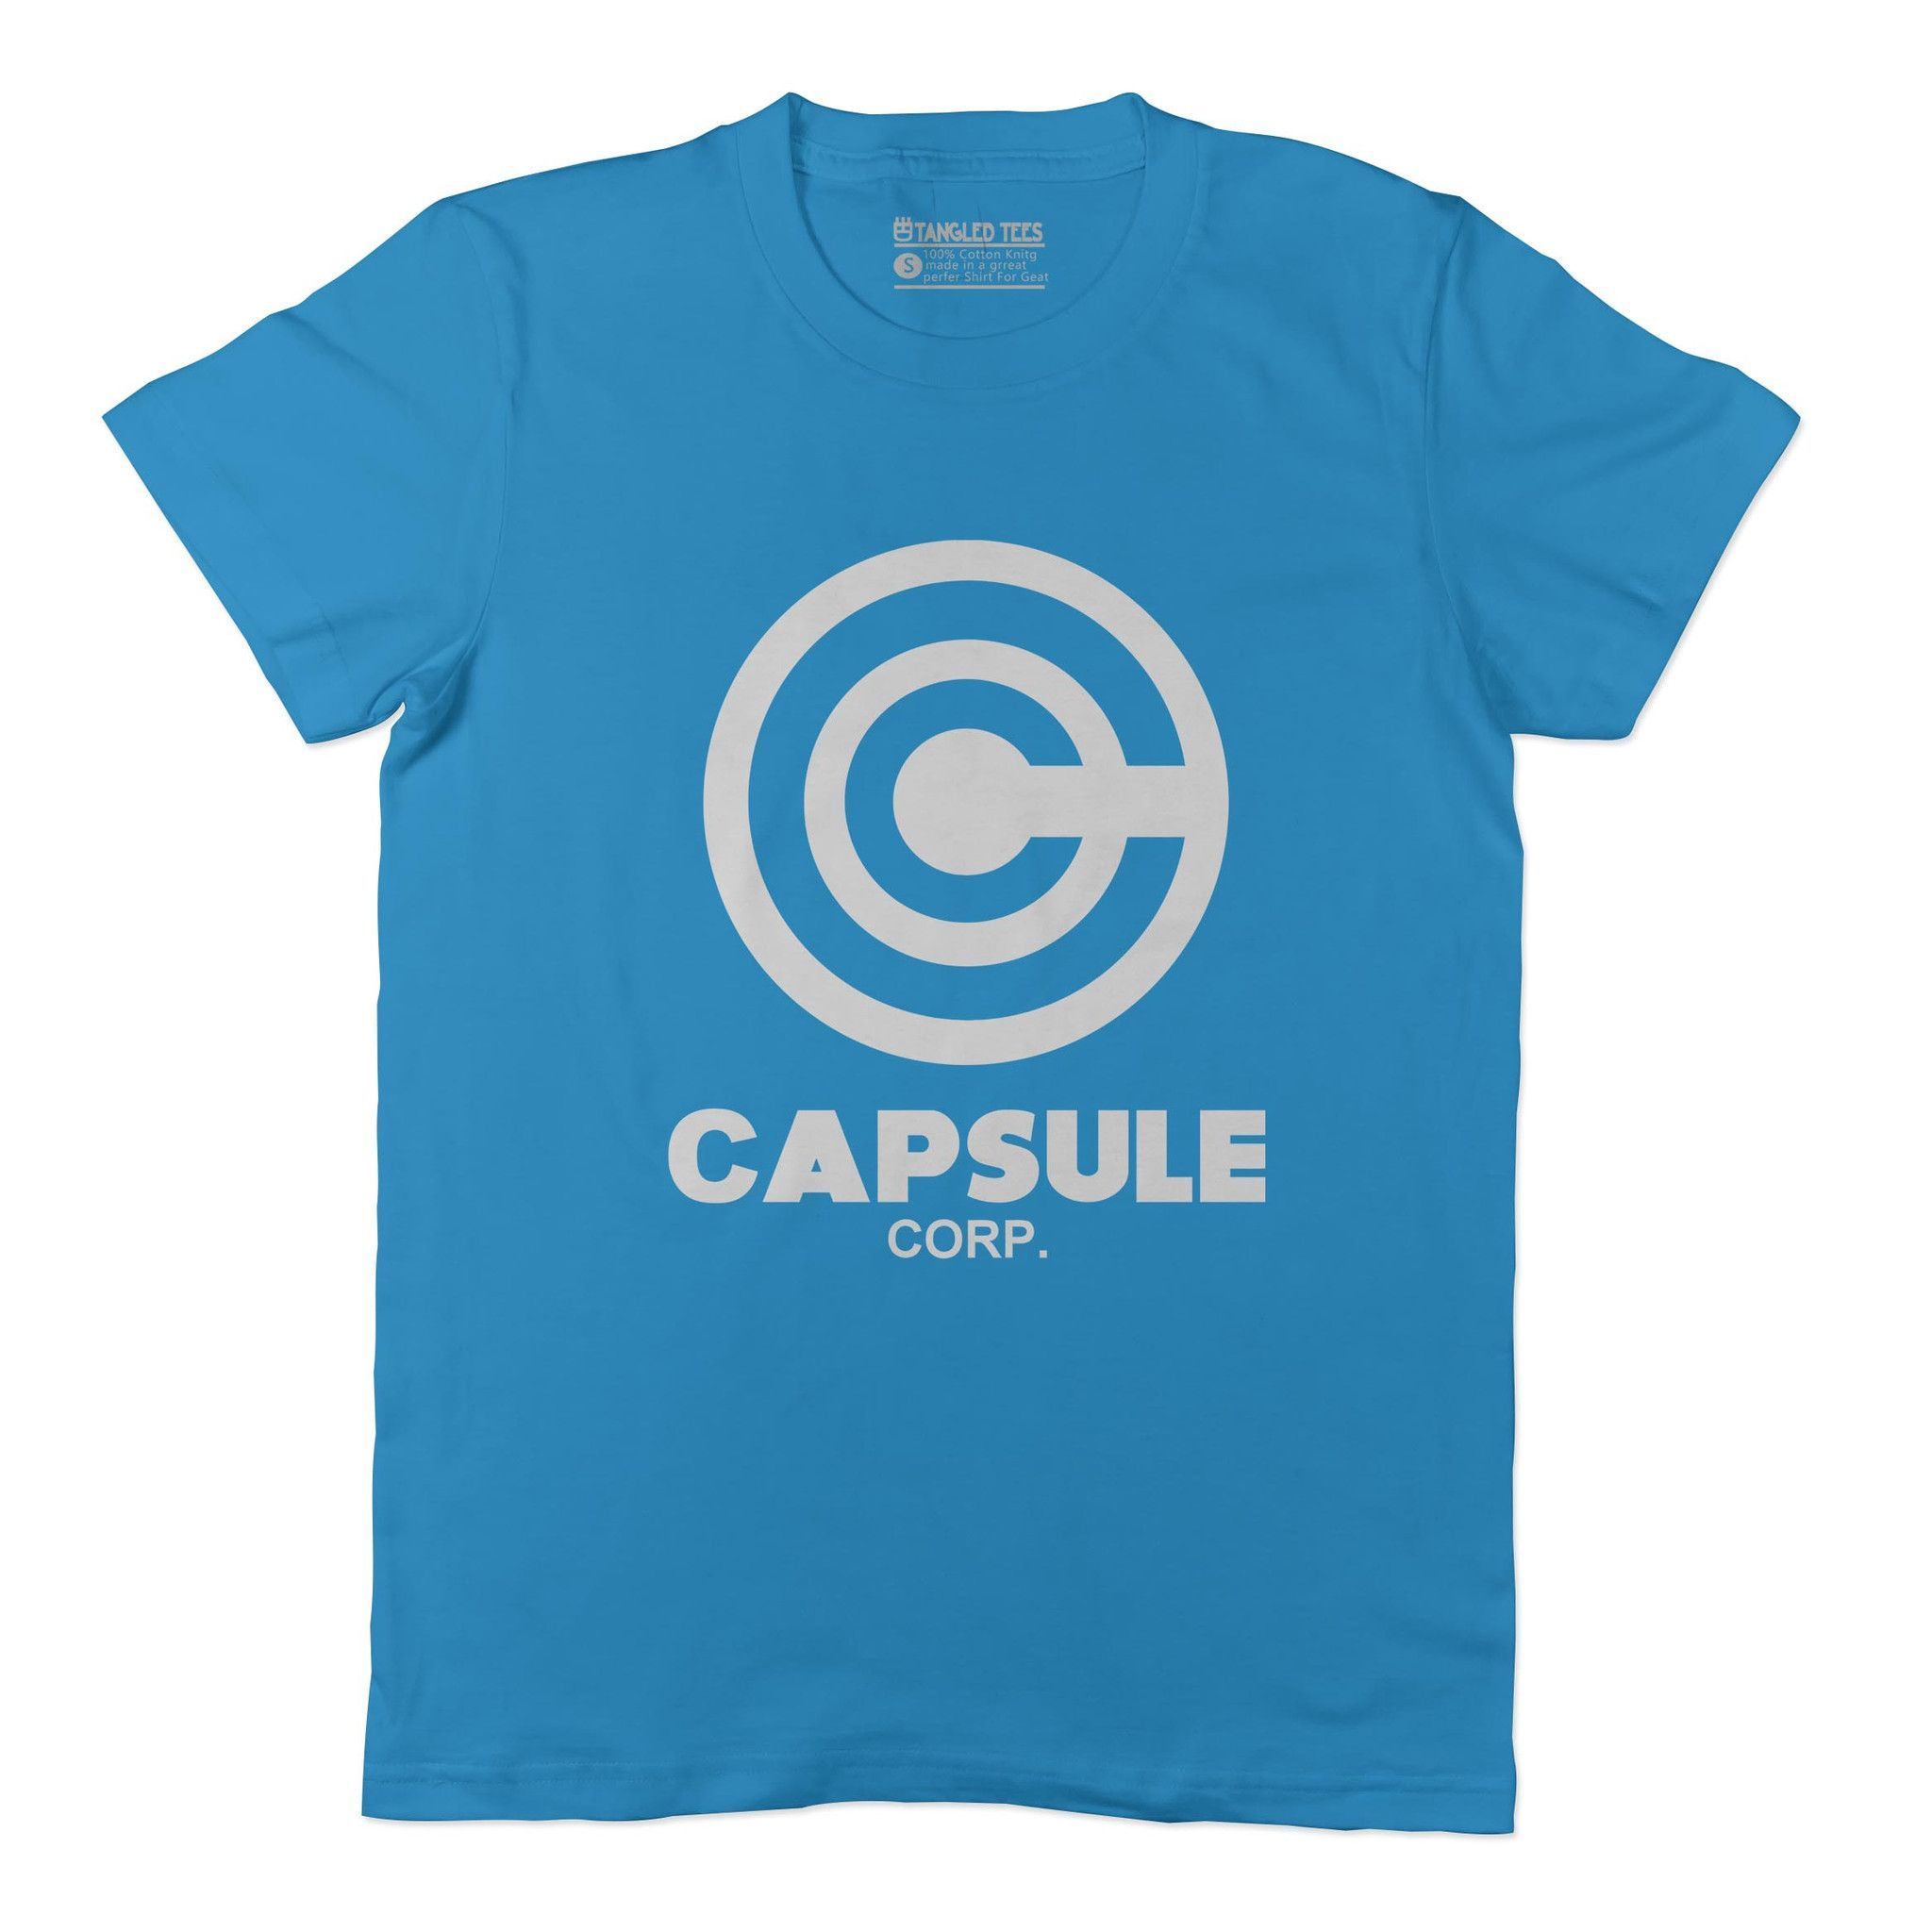 Capsule Corp Adult Tee Shirt